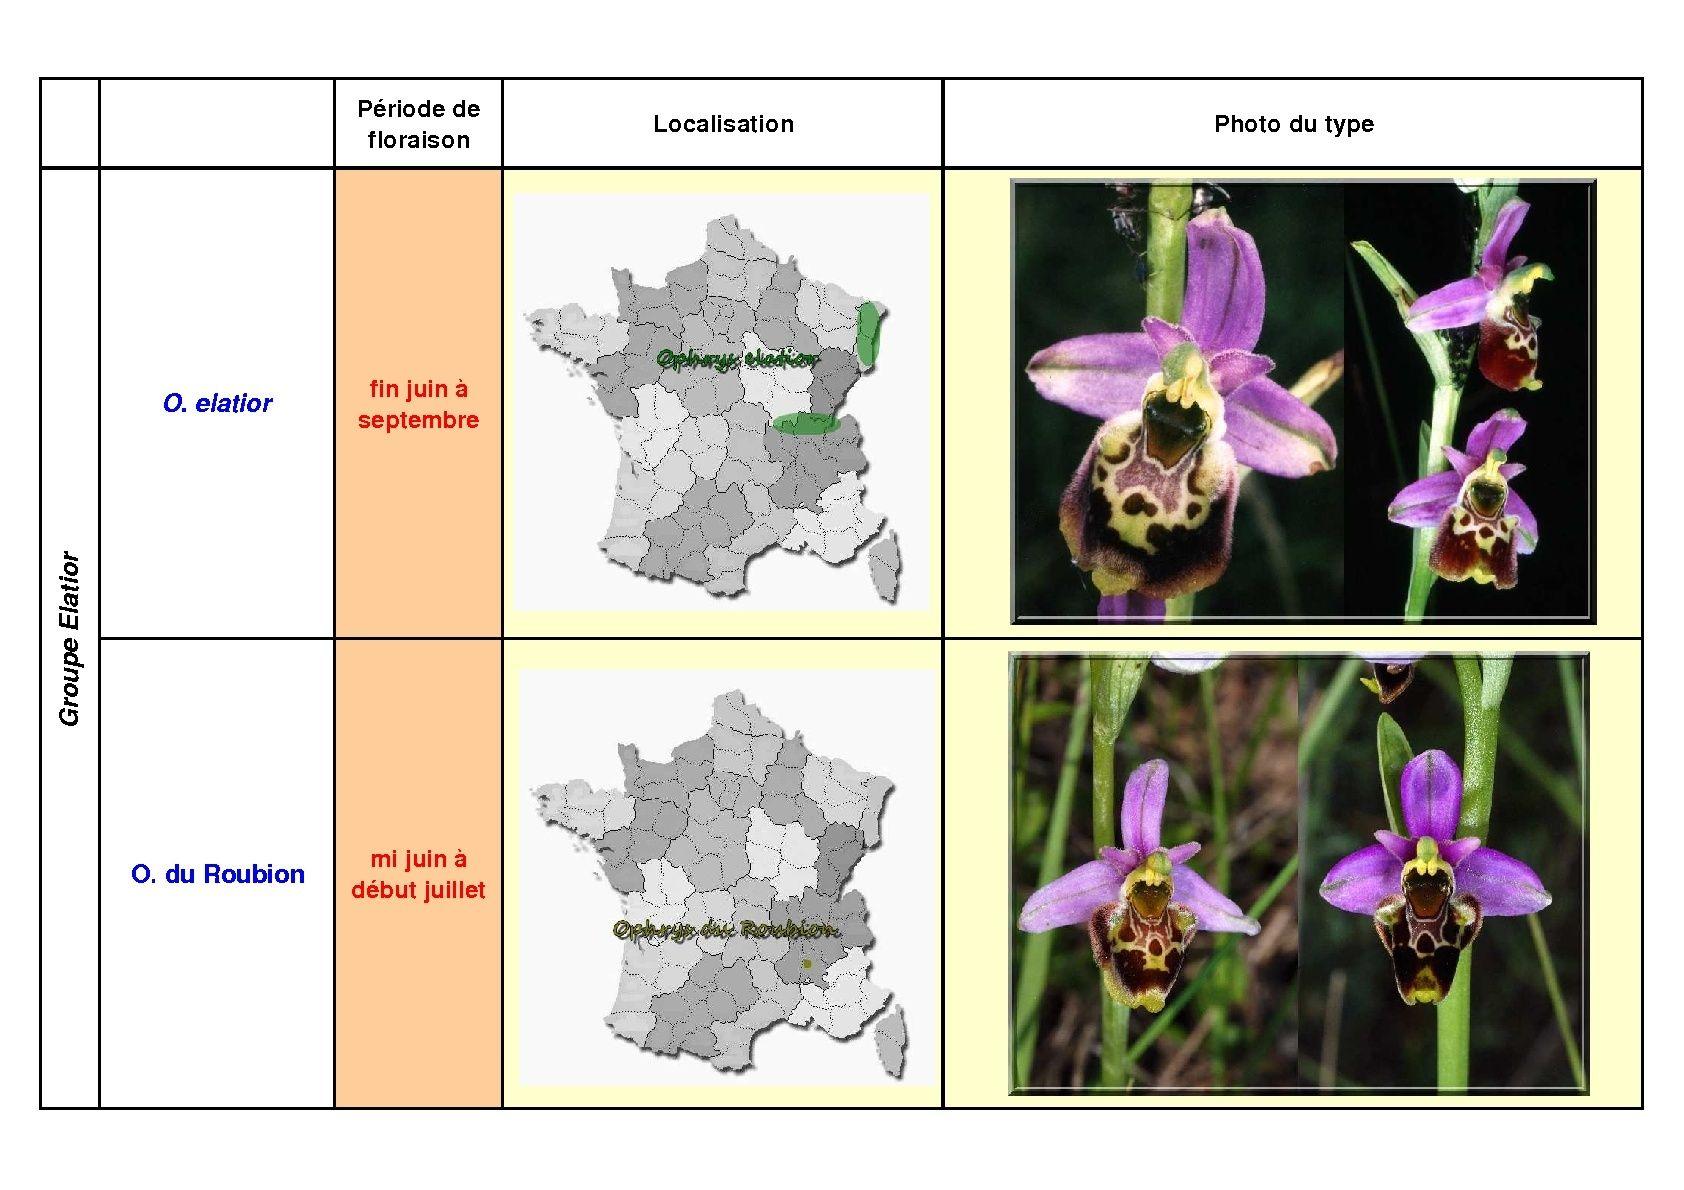 Le complexe fuciflora du Sud Est... simplifié Fucifl22